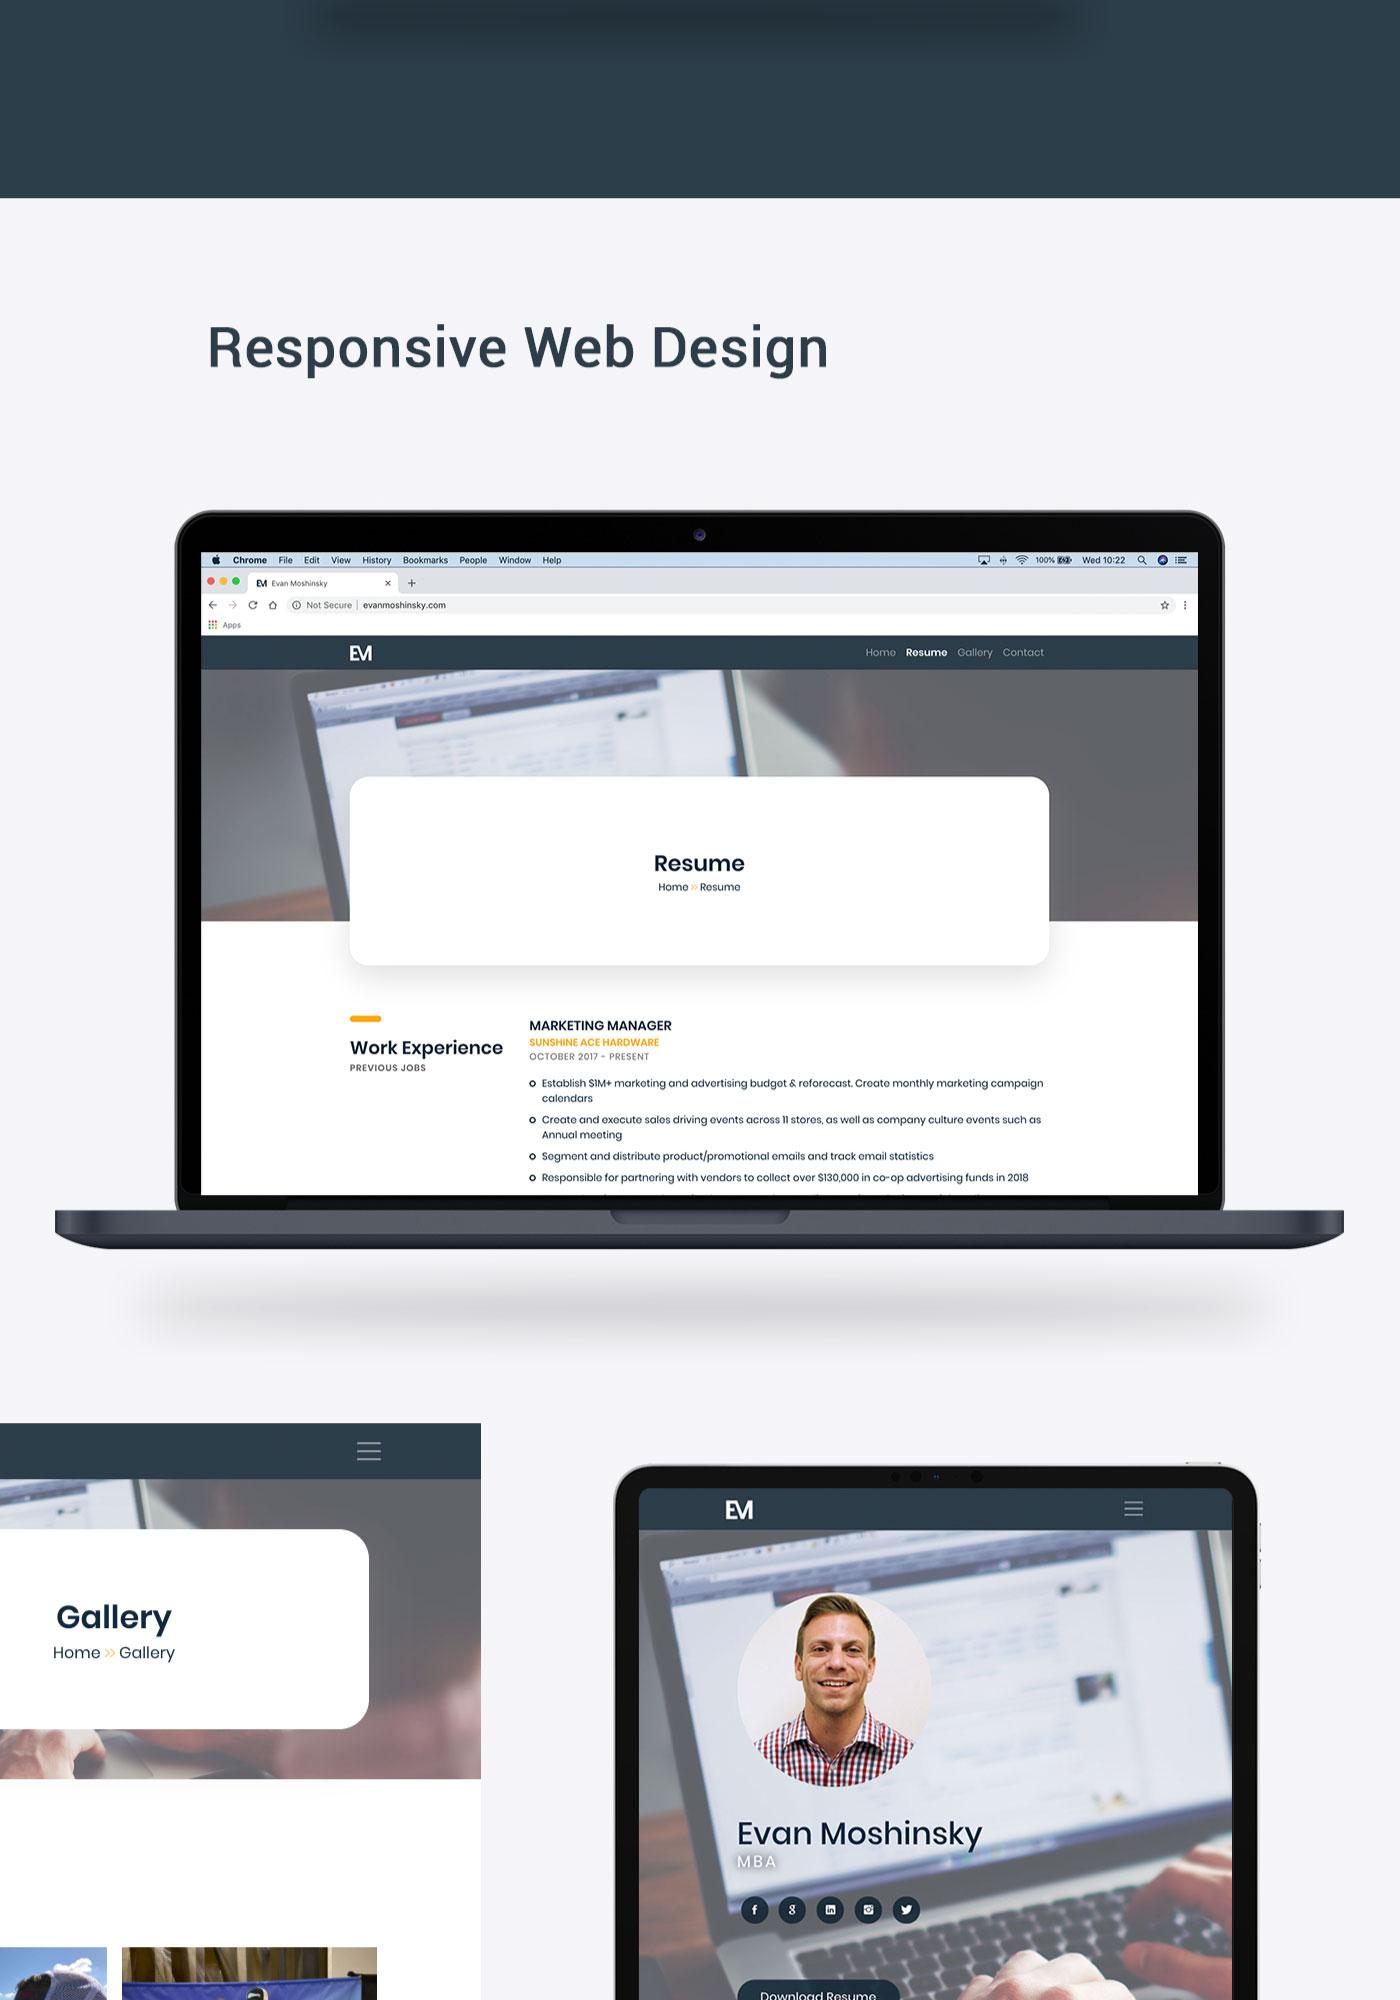 Evan Moshinsky website mockup on MacBook Pro and iPad